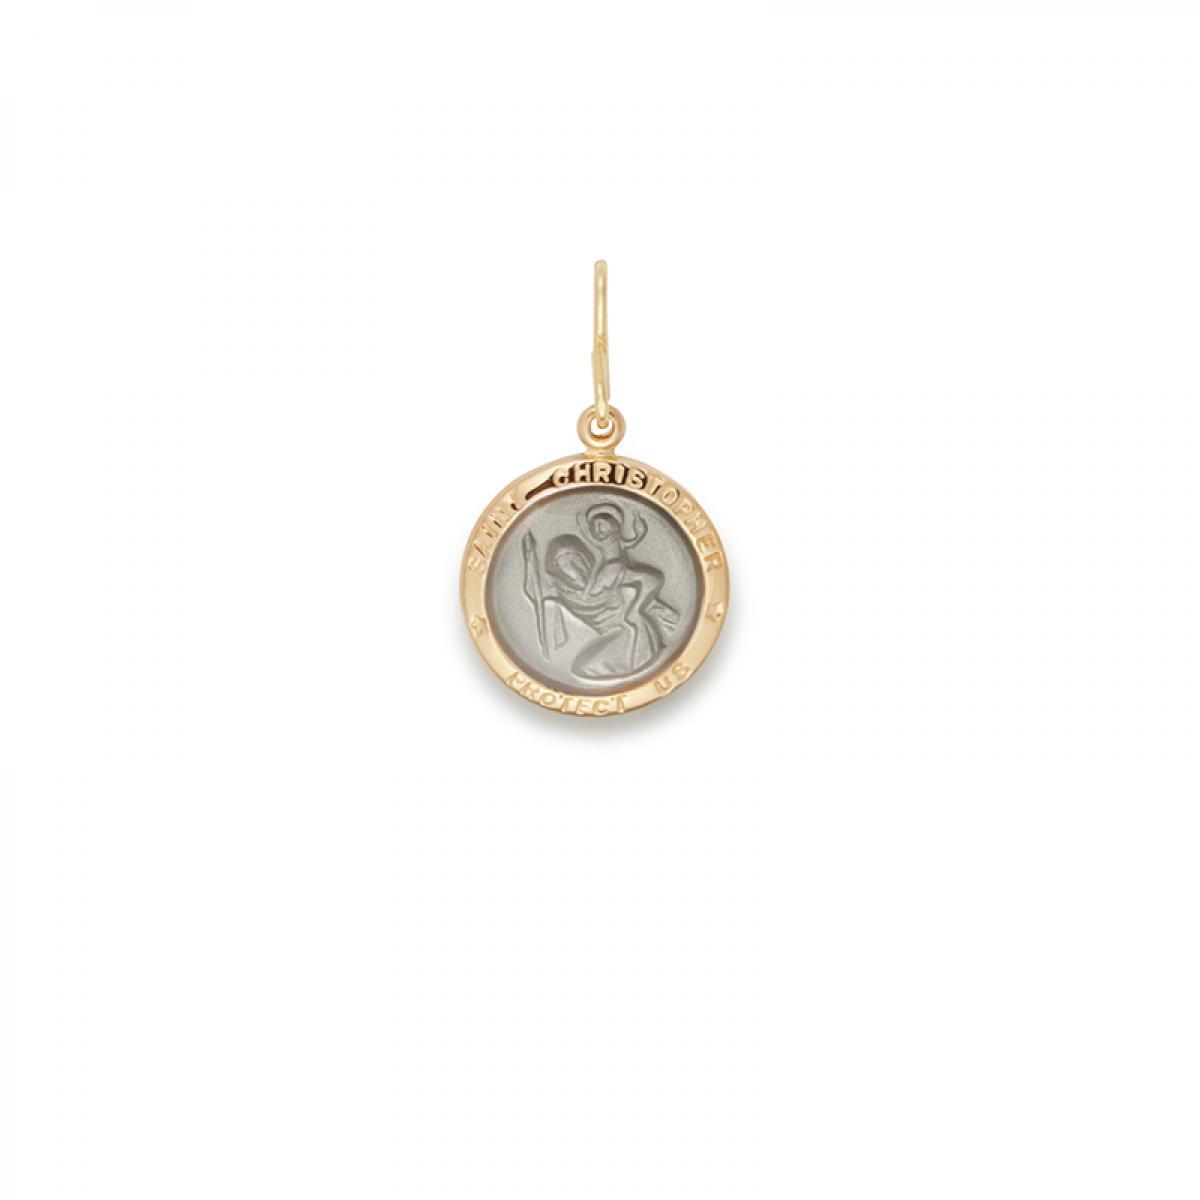 f535fd5b736 ALEX AND ANI. Women's Metallic Two Tone Saint Christopher Necklace Charm